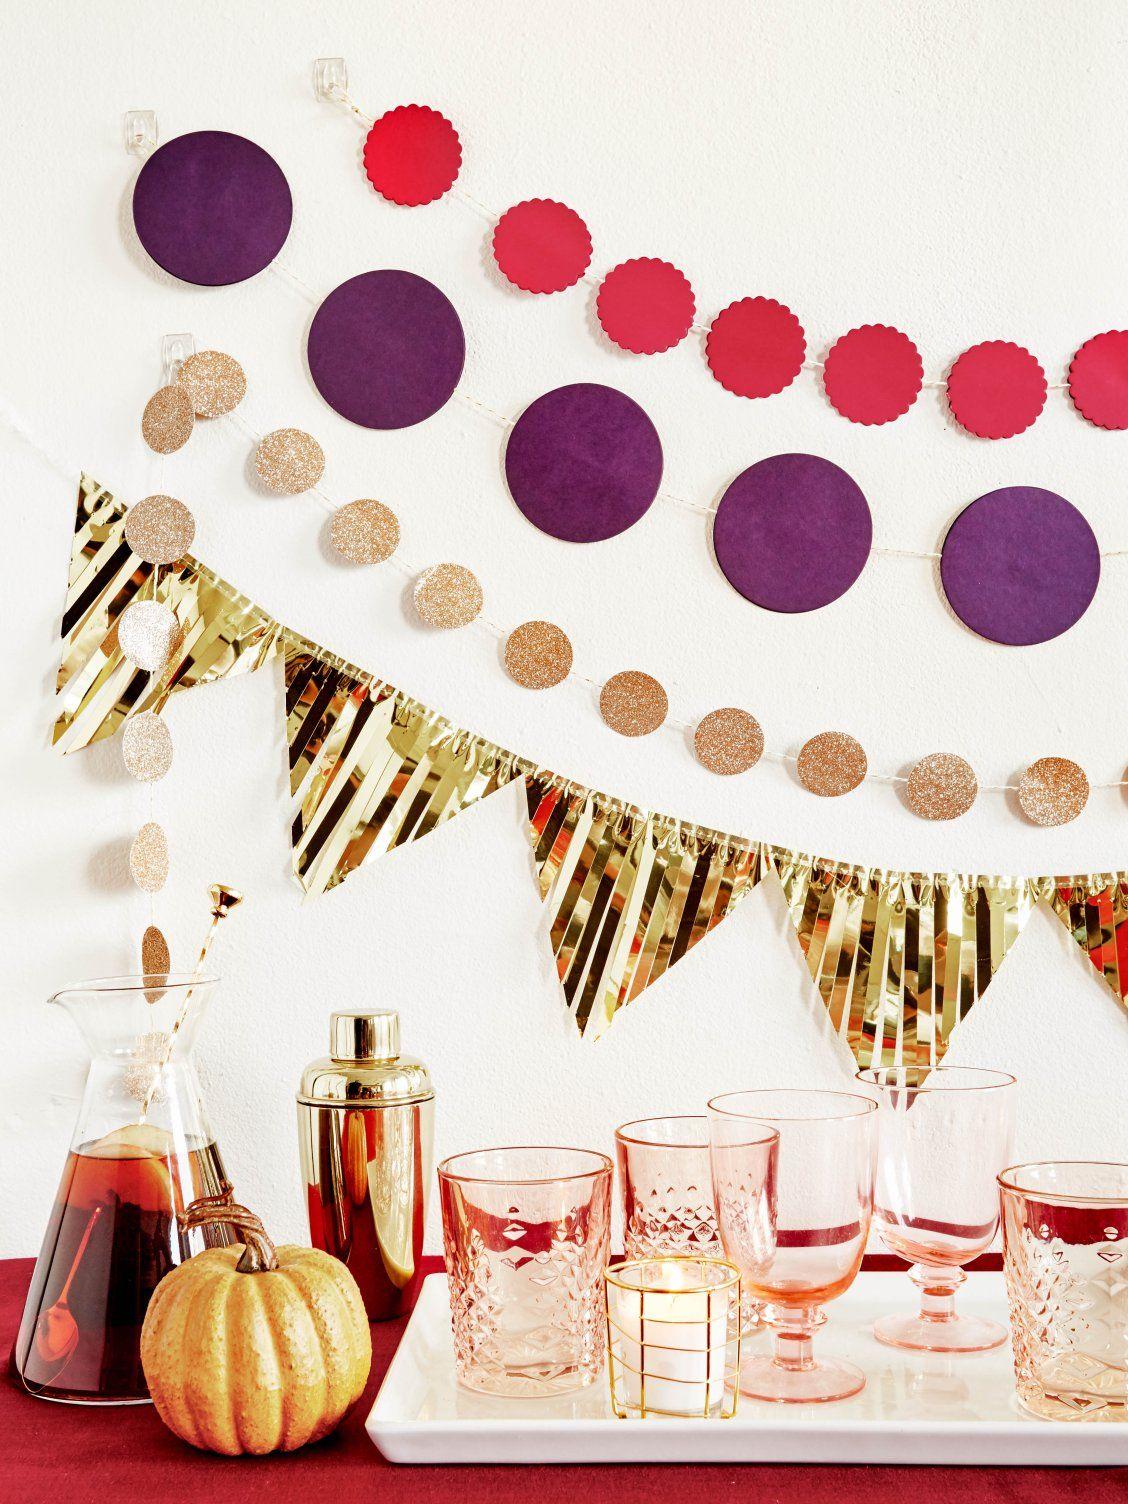 3 Ideas for Easy, Fuss-Free Friendsgiving Decorating | Diys ...